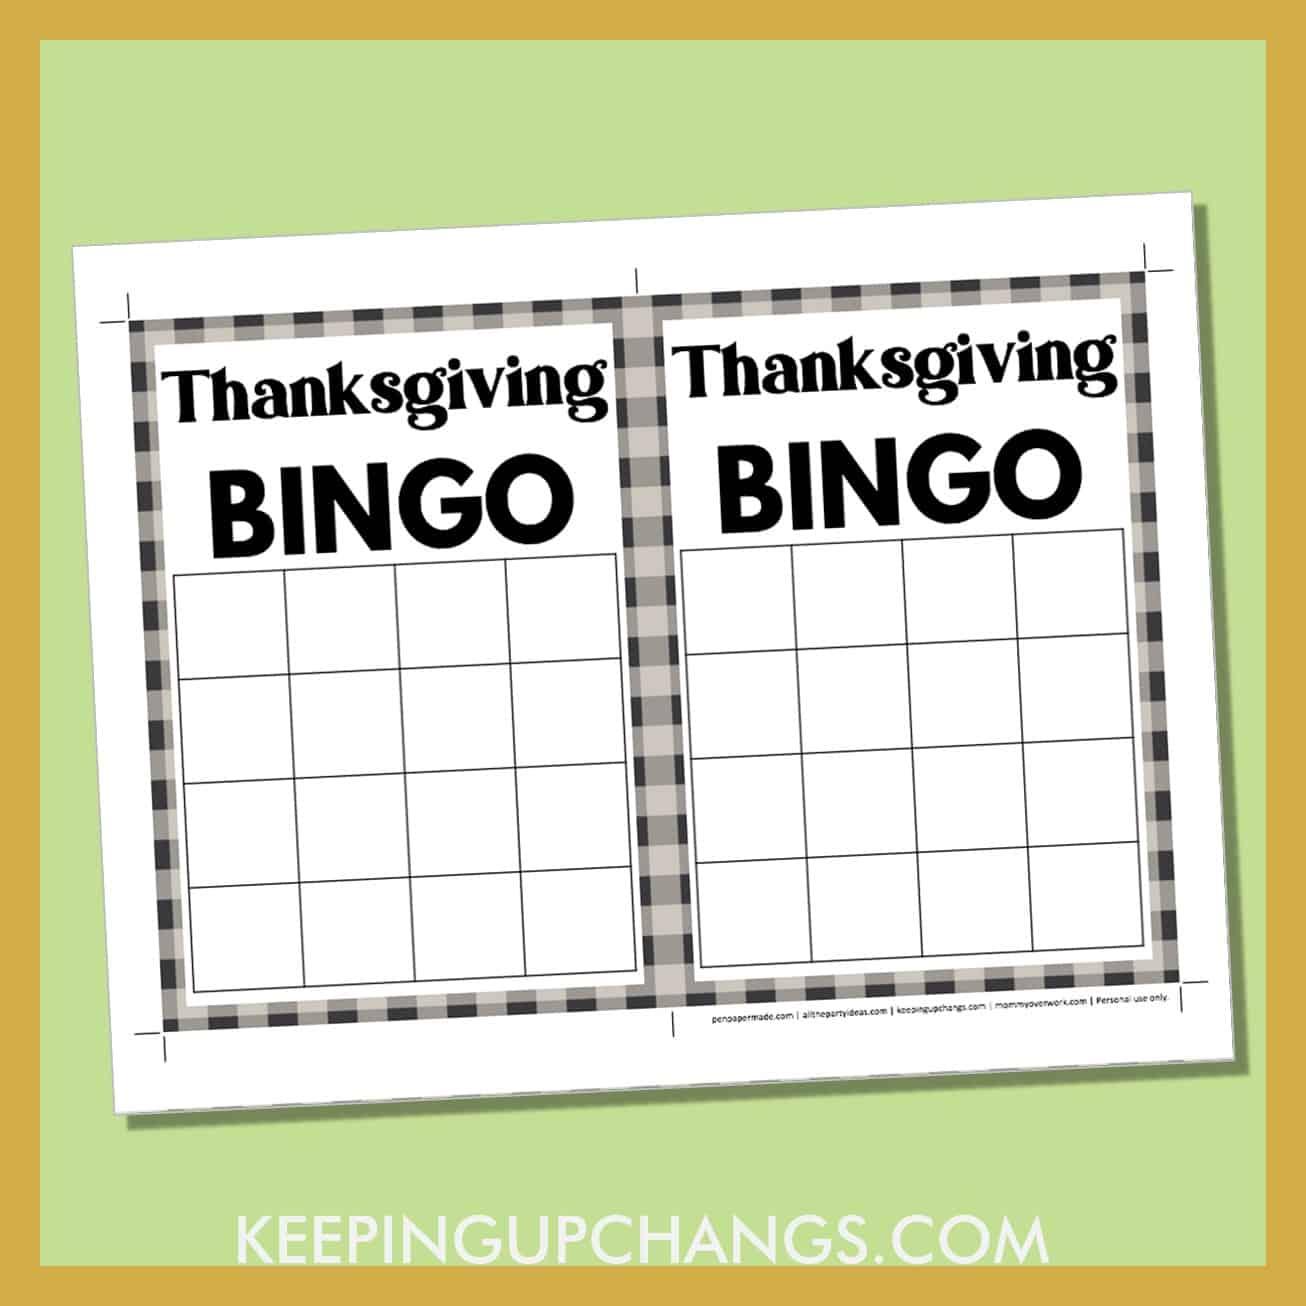 free thanksgiving bingo 4x4 grid black white game board blank template.